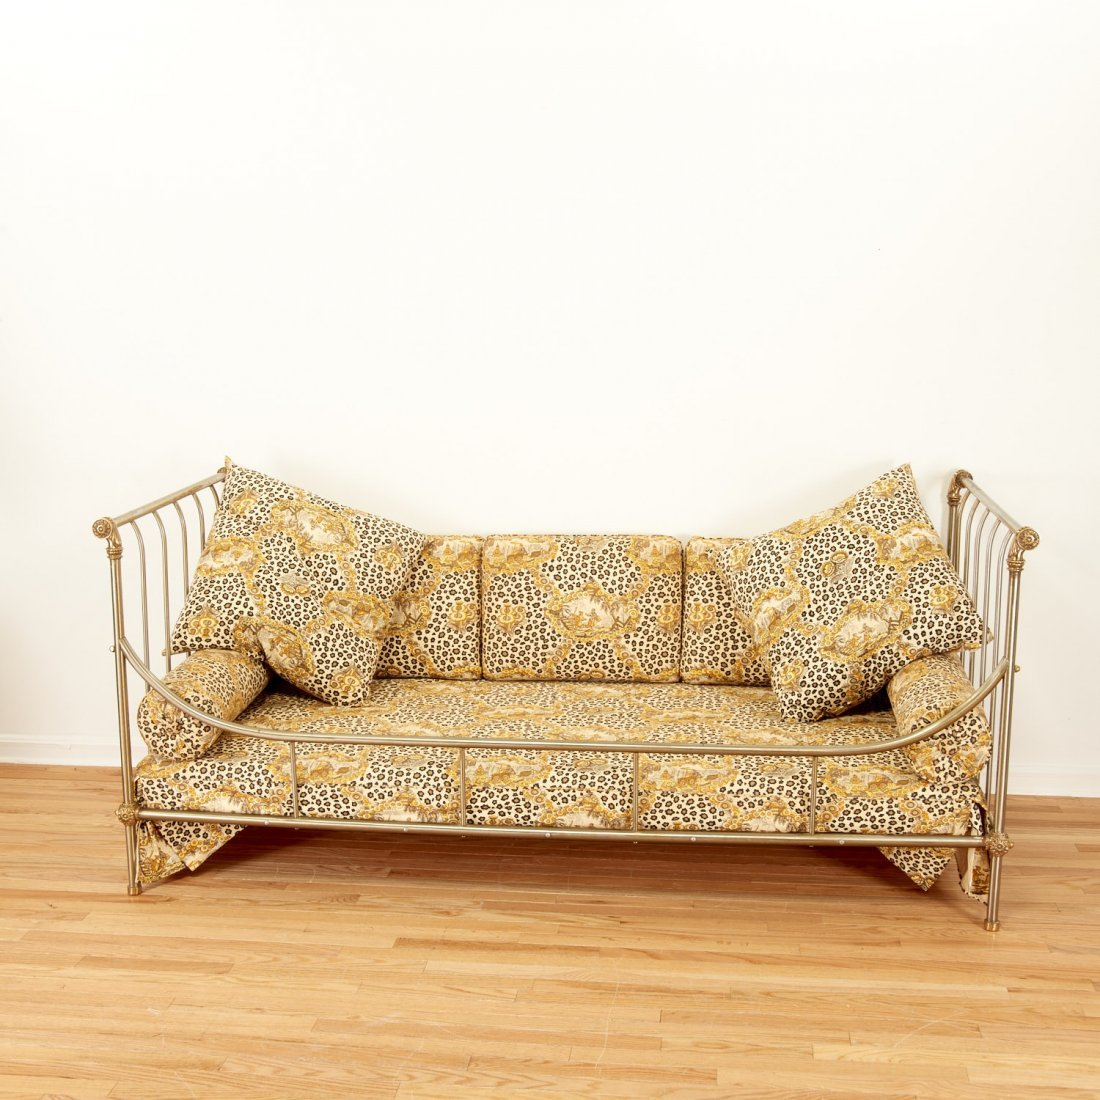 Maison Jansen style brass, steel campaign bed - 2